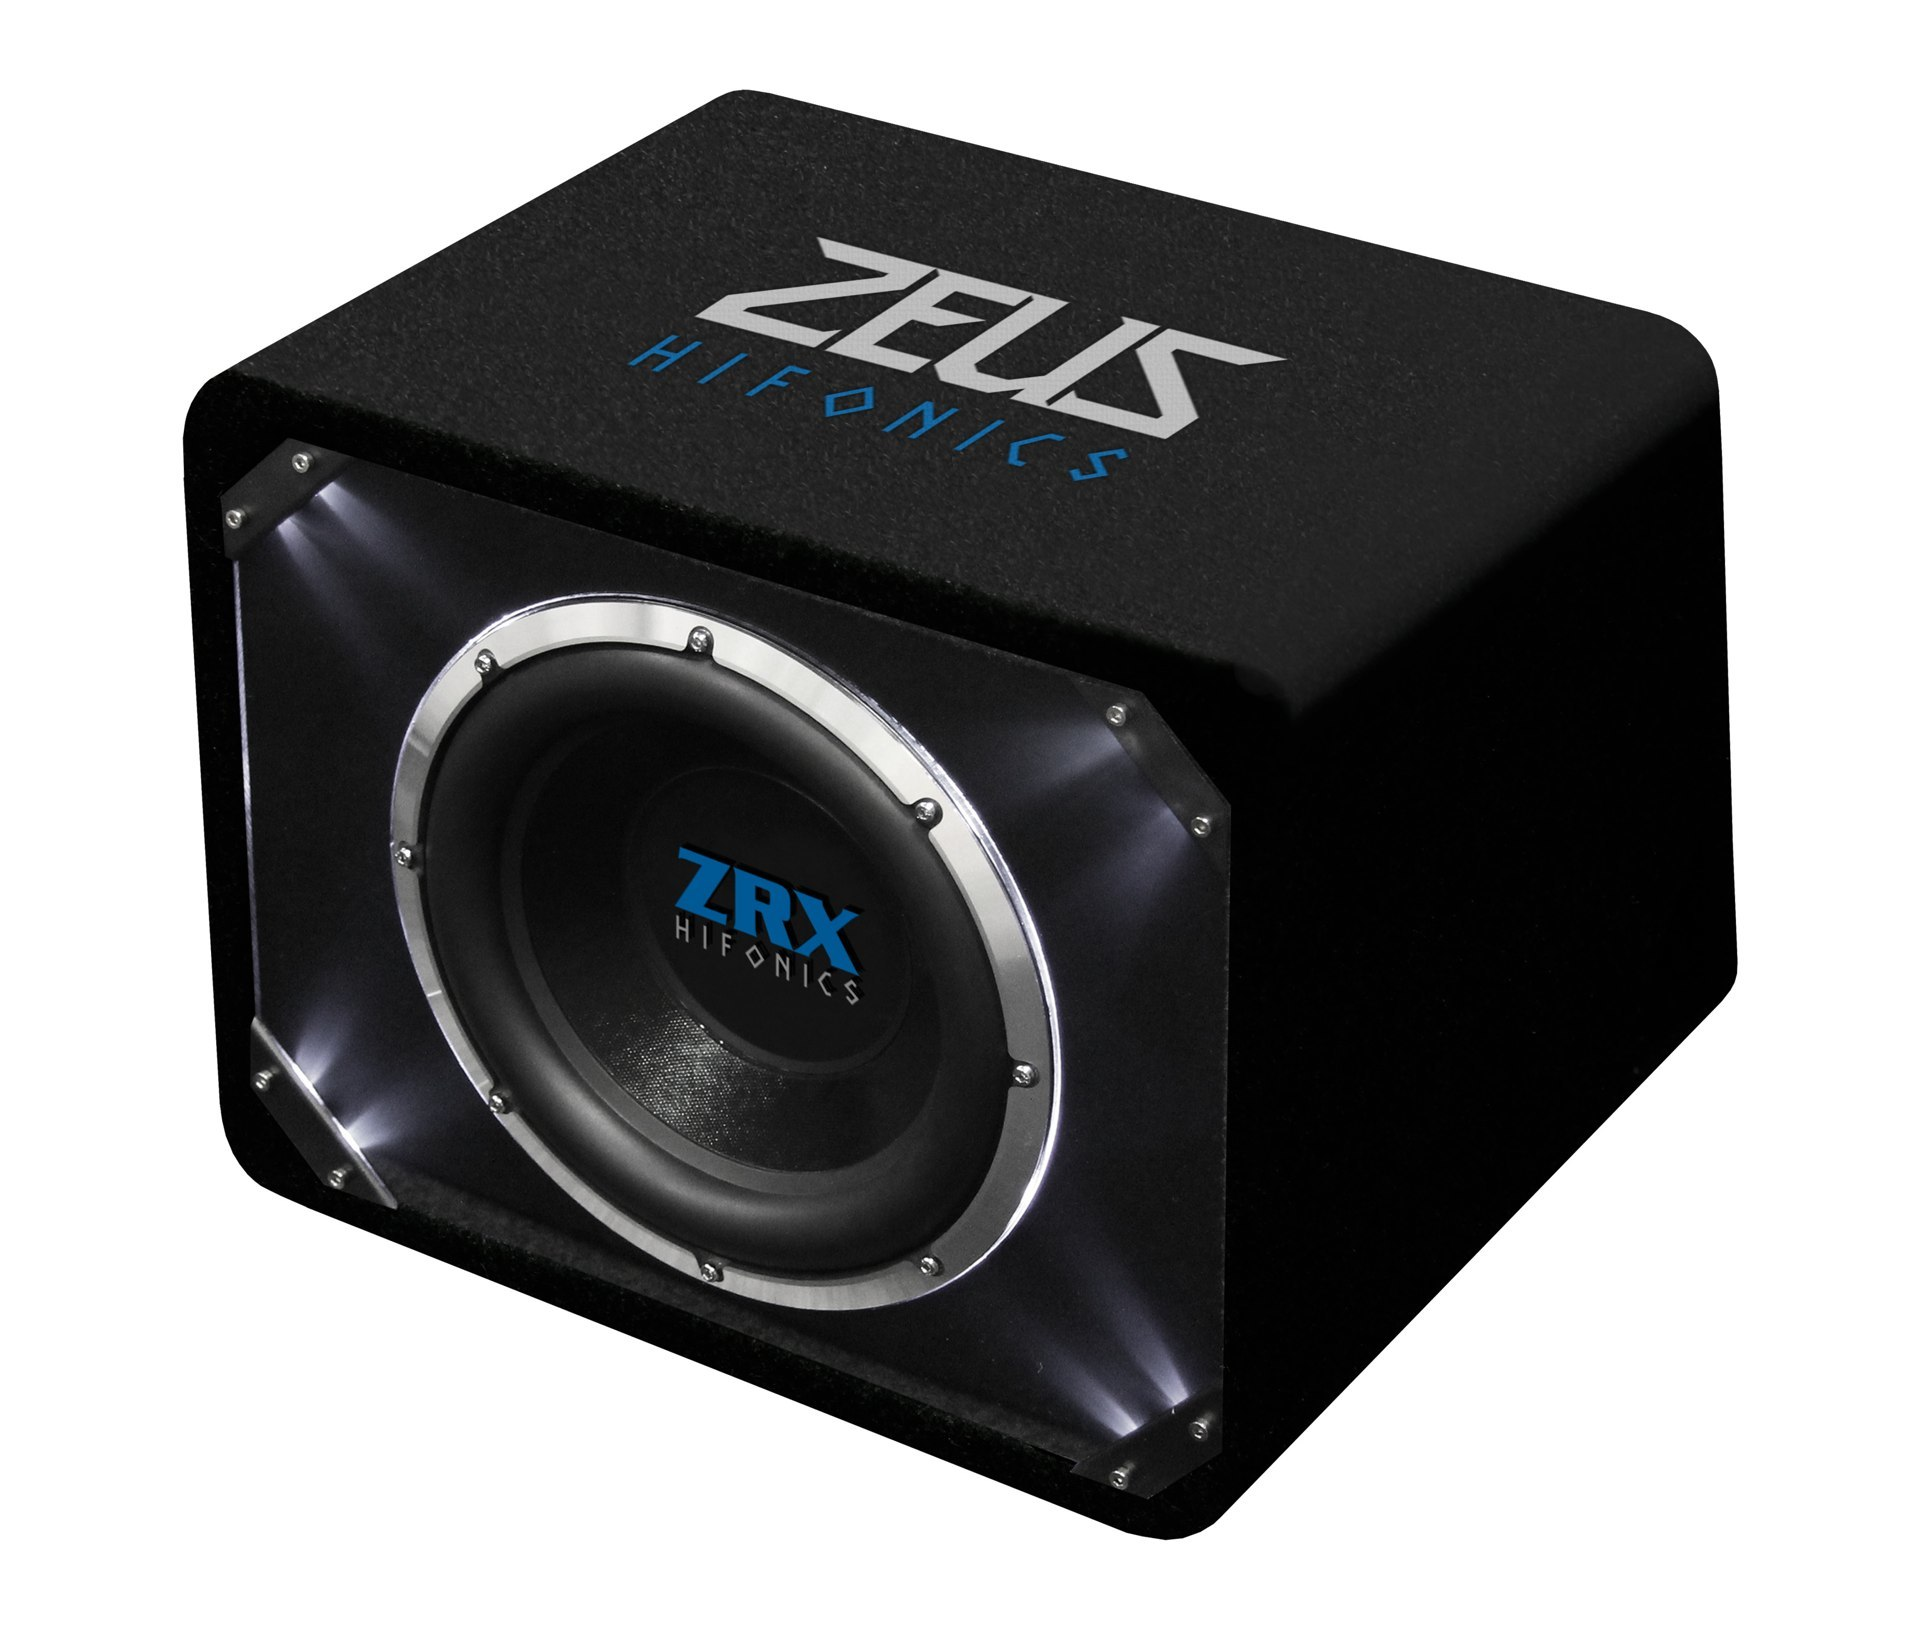 hifonics auto subwoofer bassbox zrx 12 30cm 1500w. Black Bedroom Furniture Sets. Home Design Ideas